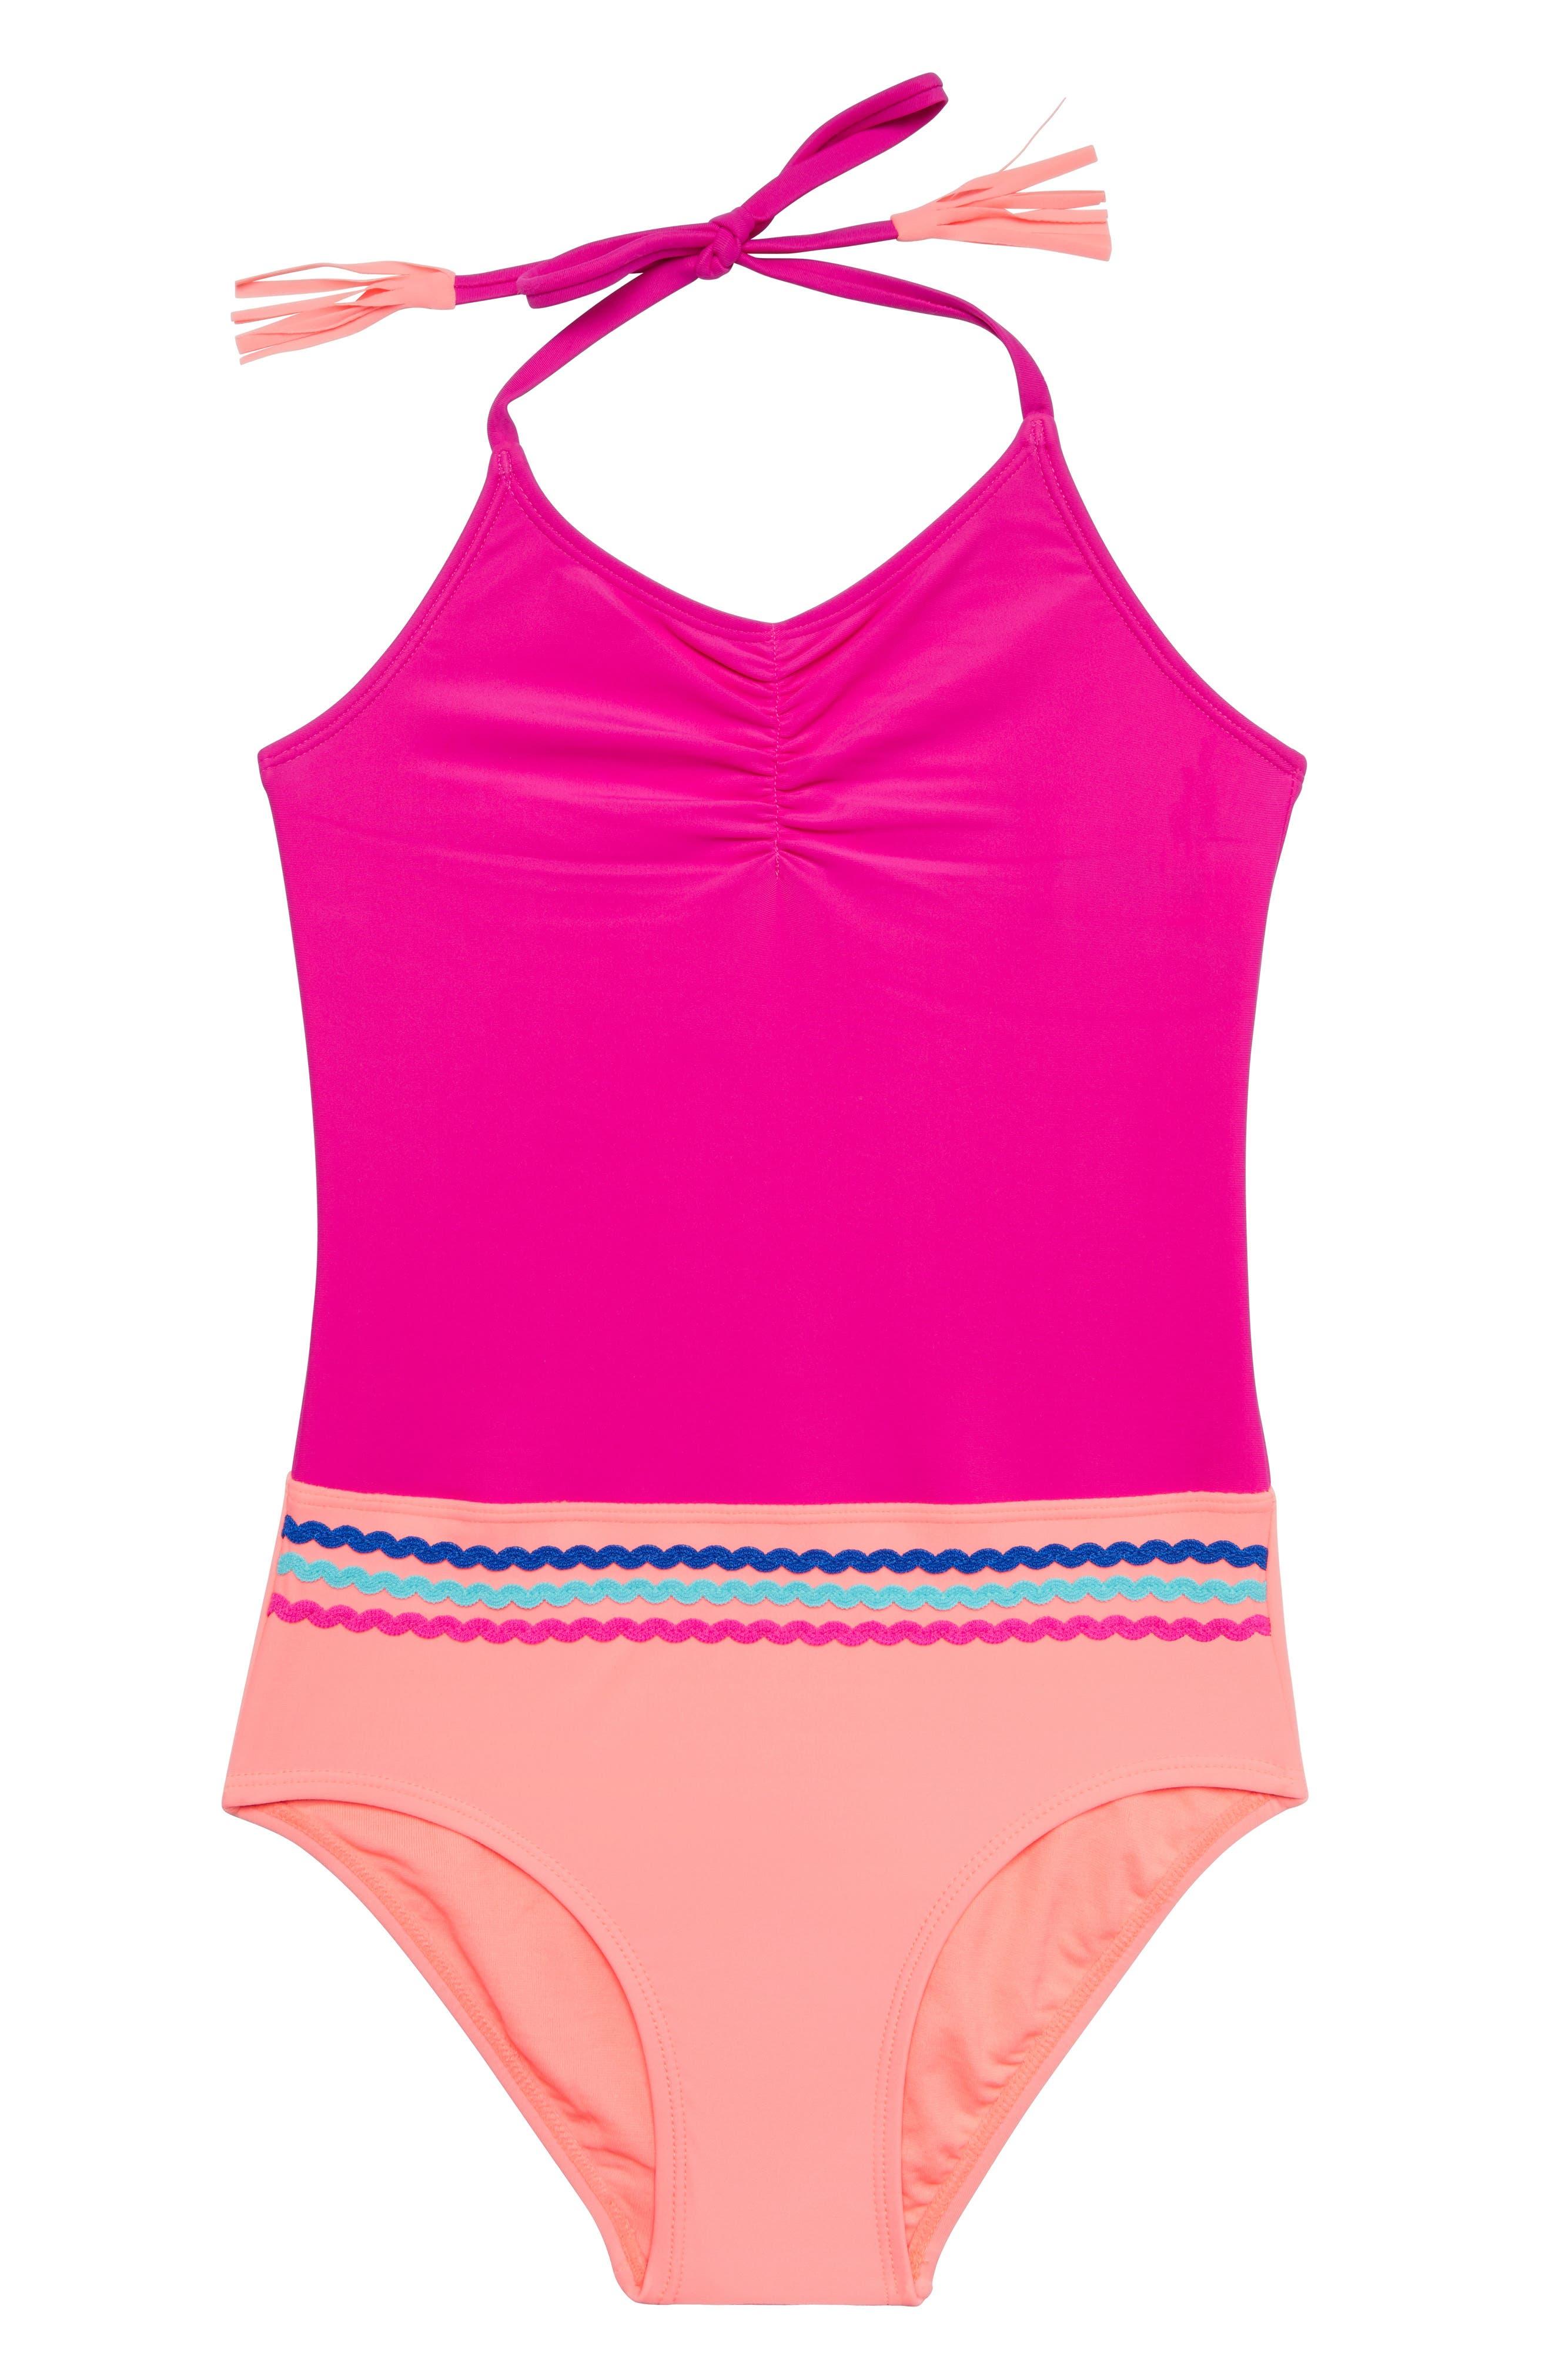 Malibu Stripe One-Piece Swimsuit,                             Main thumbnail 1, color,                             PINK/ MULTI